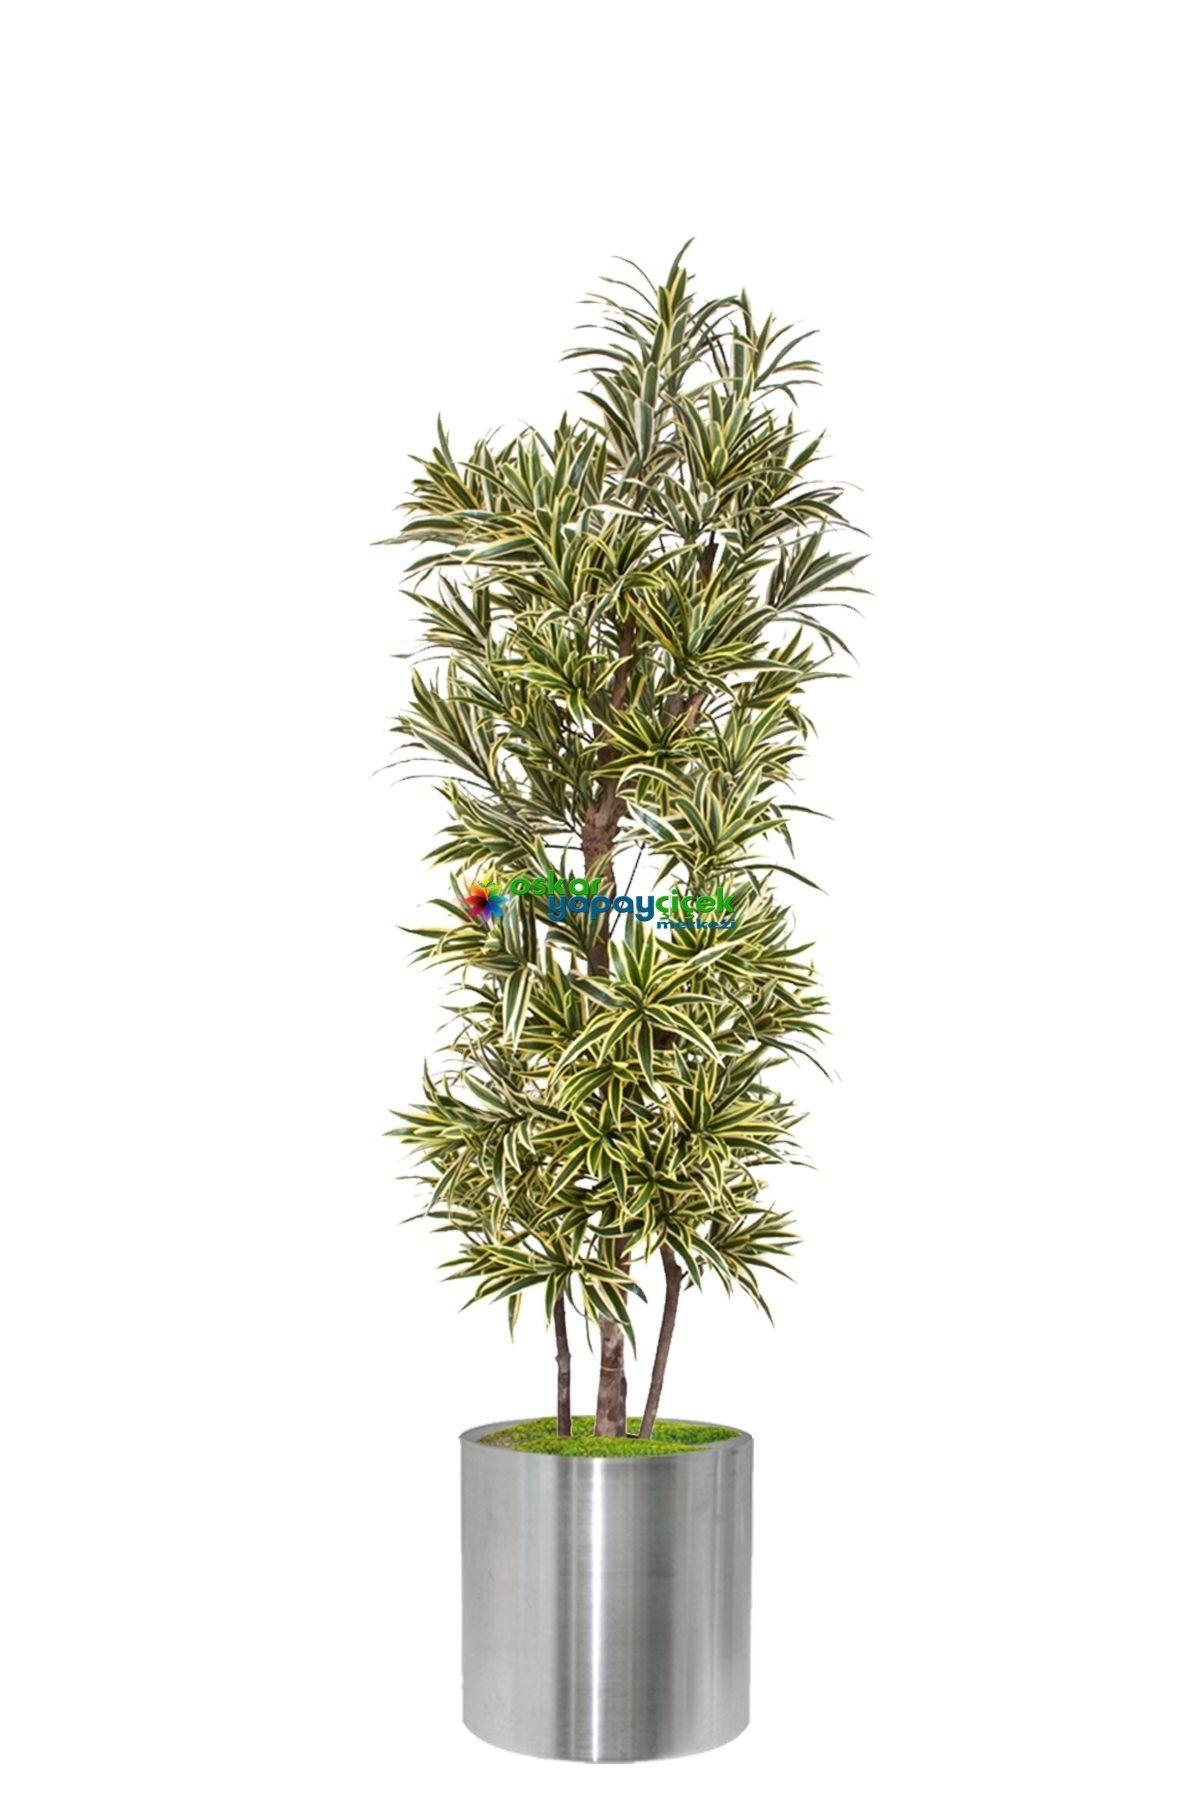 oskar yapay ağaç